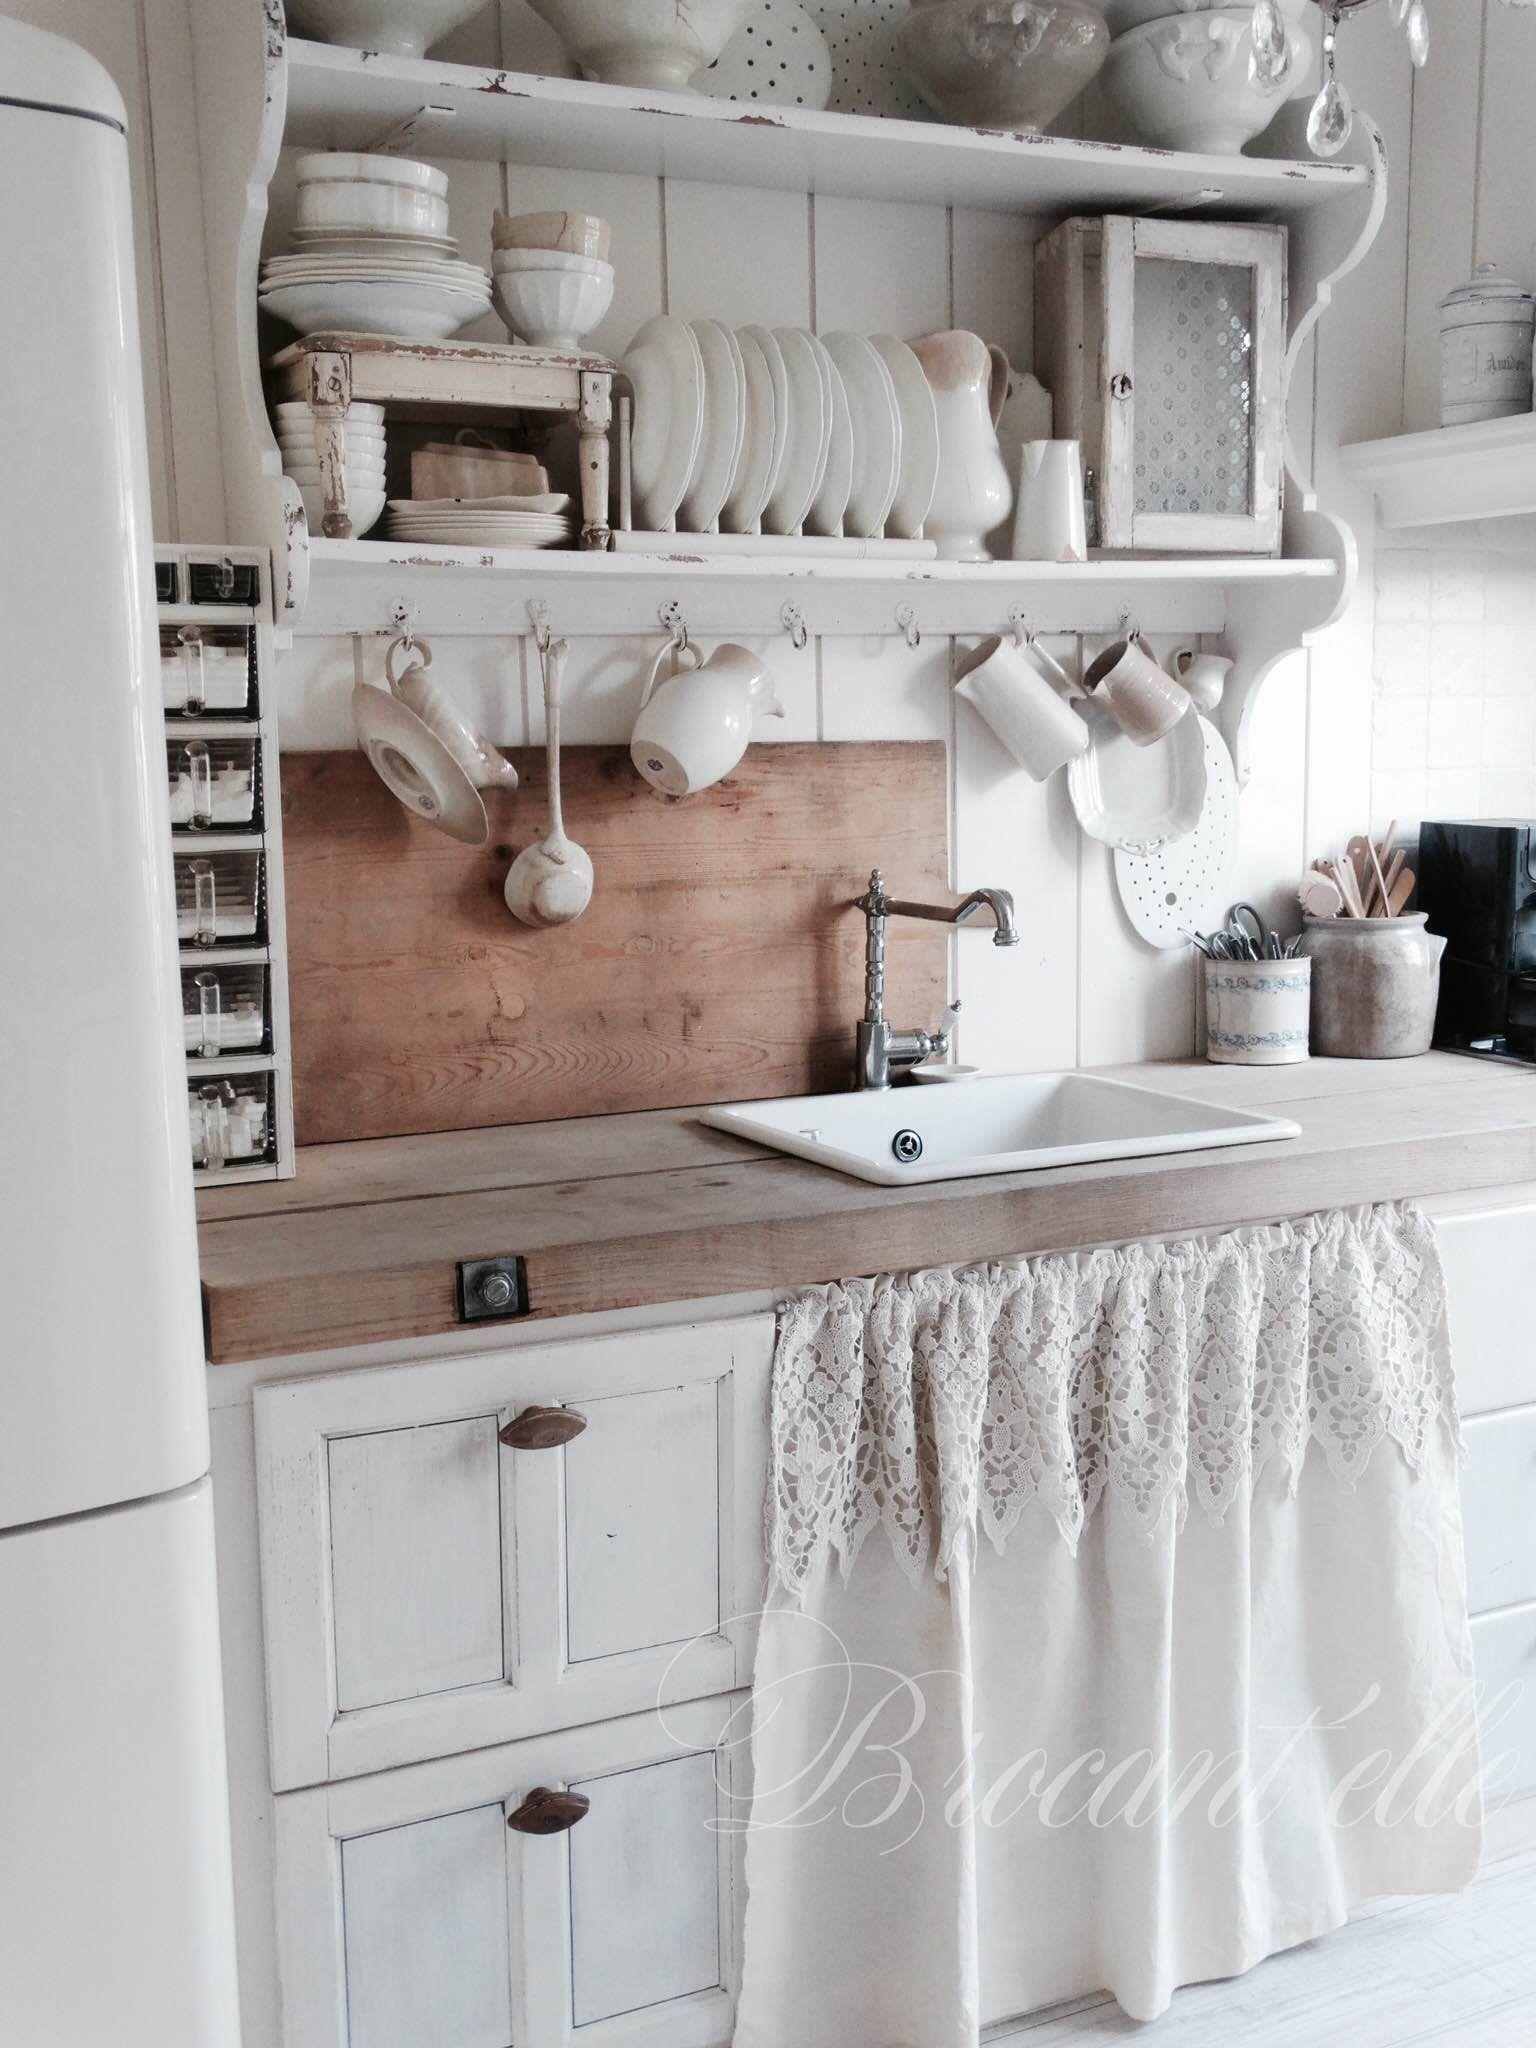 Rustic Interiors - Brocante Blog | Cuisine | Pinterest | Küche ...